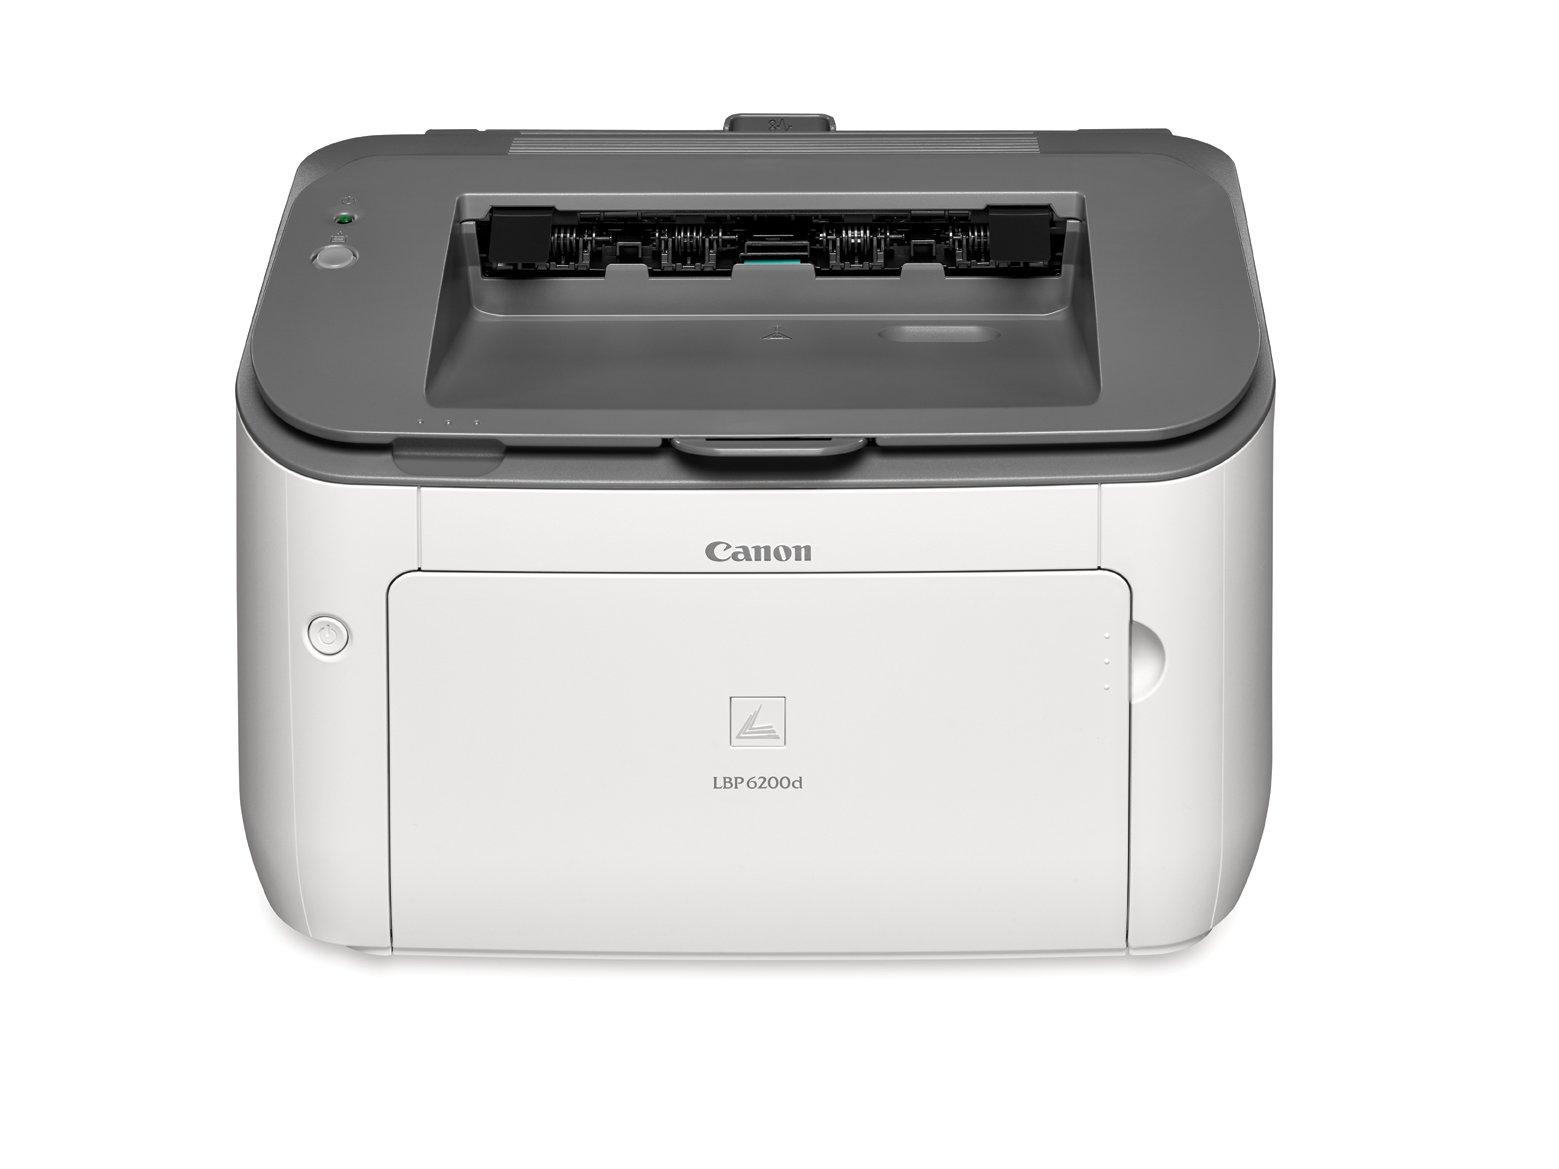 Canon imageCLASS Monochrome Laser Printer, LBP6200D (Discontinued by Manufacturer) by Canon